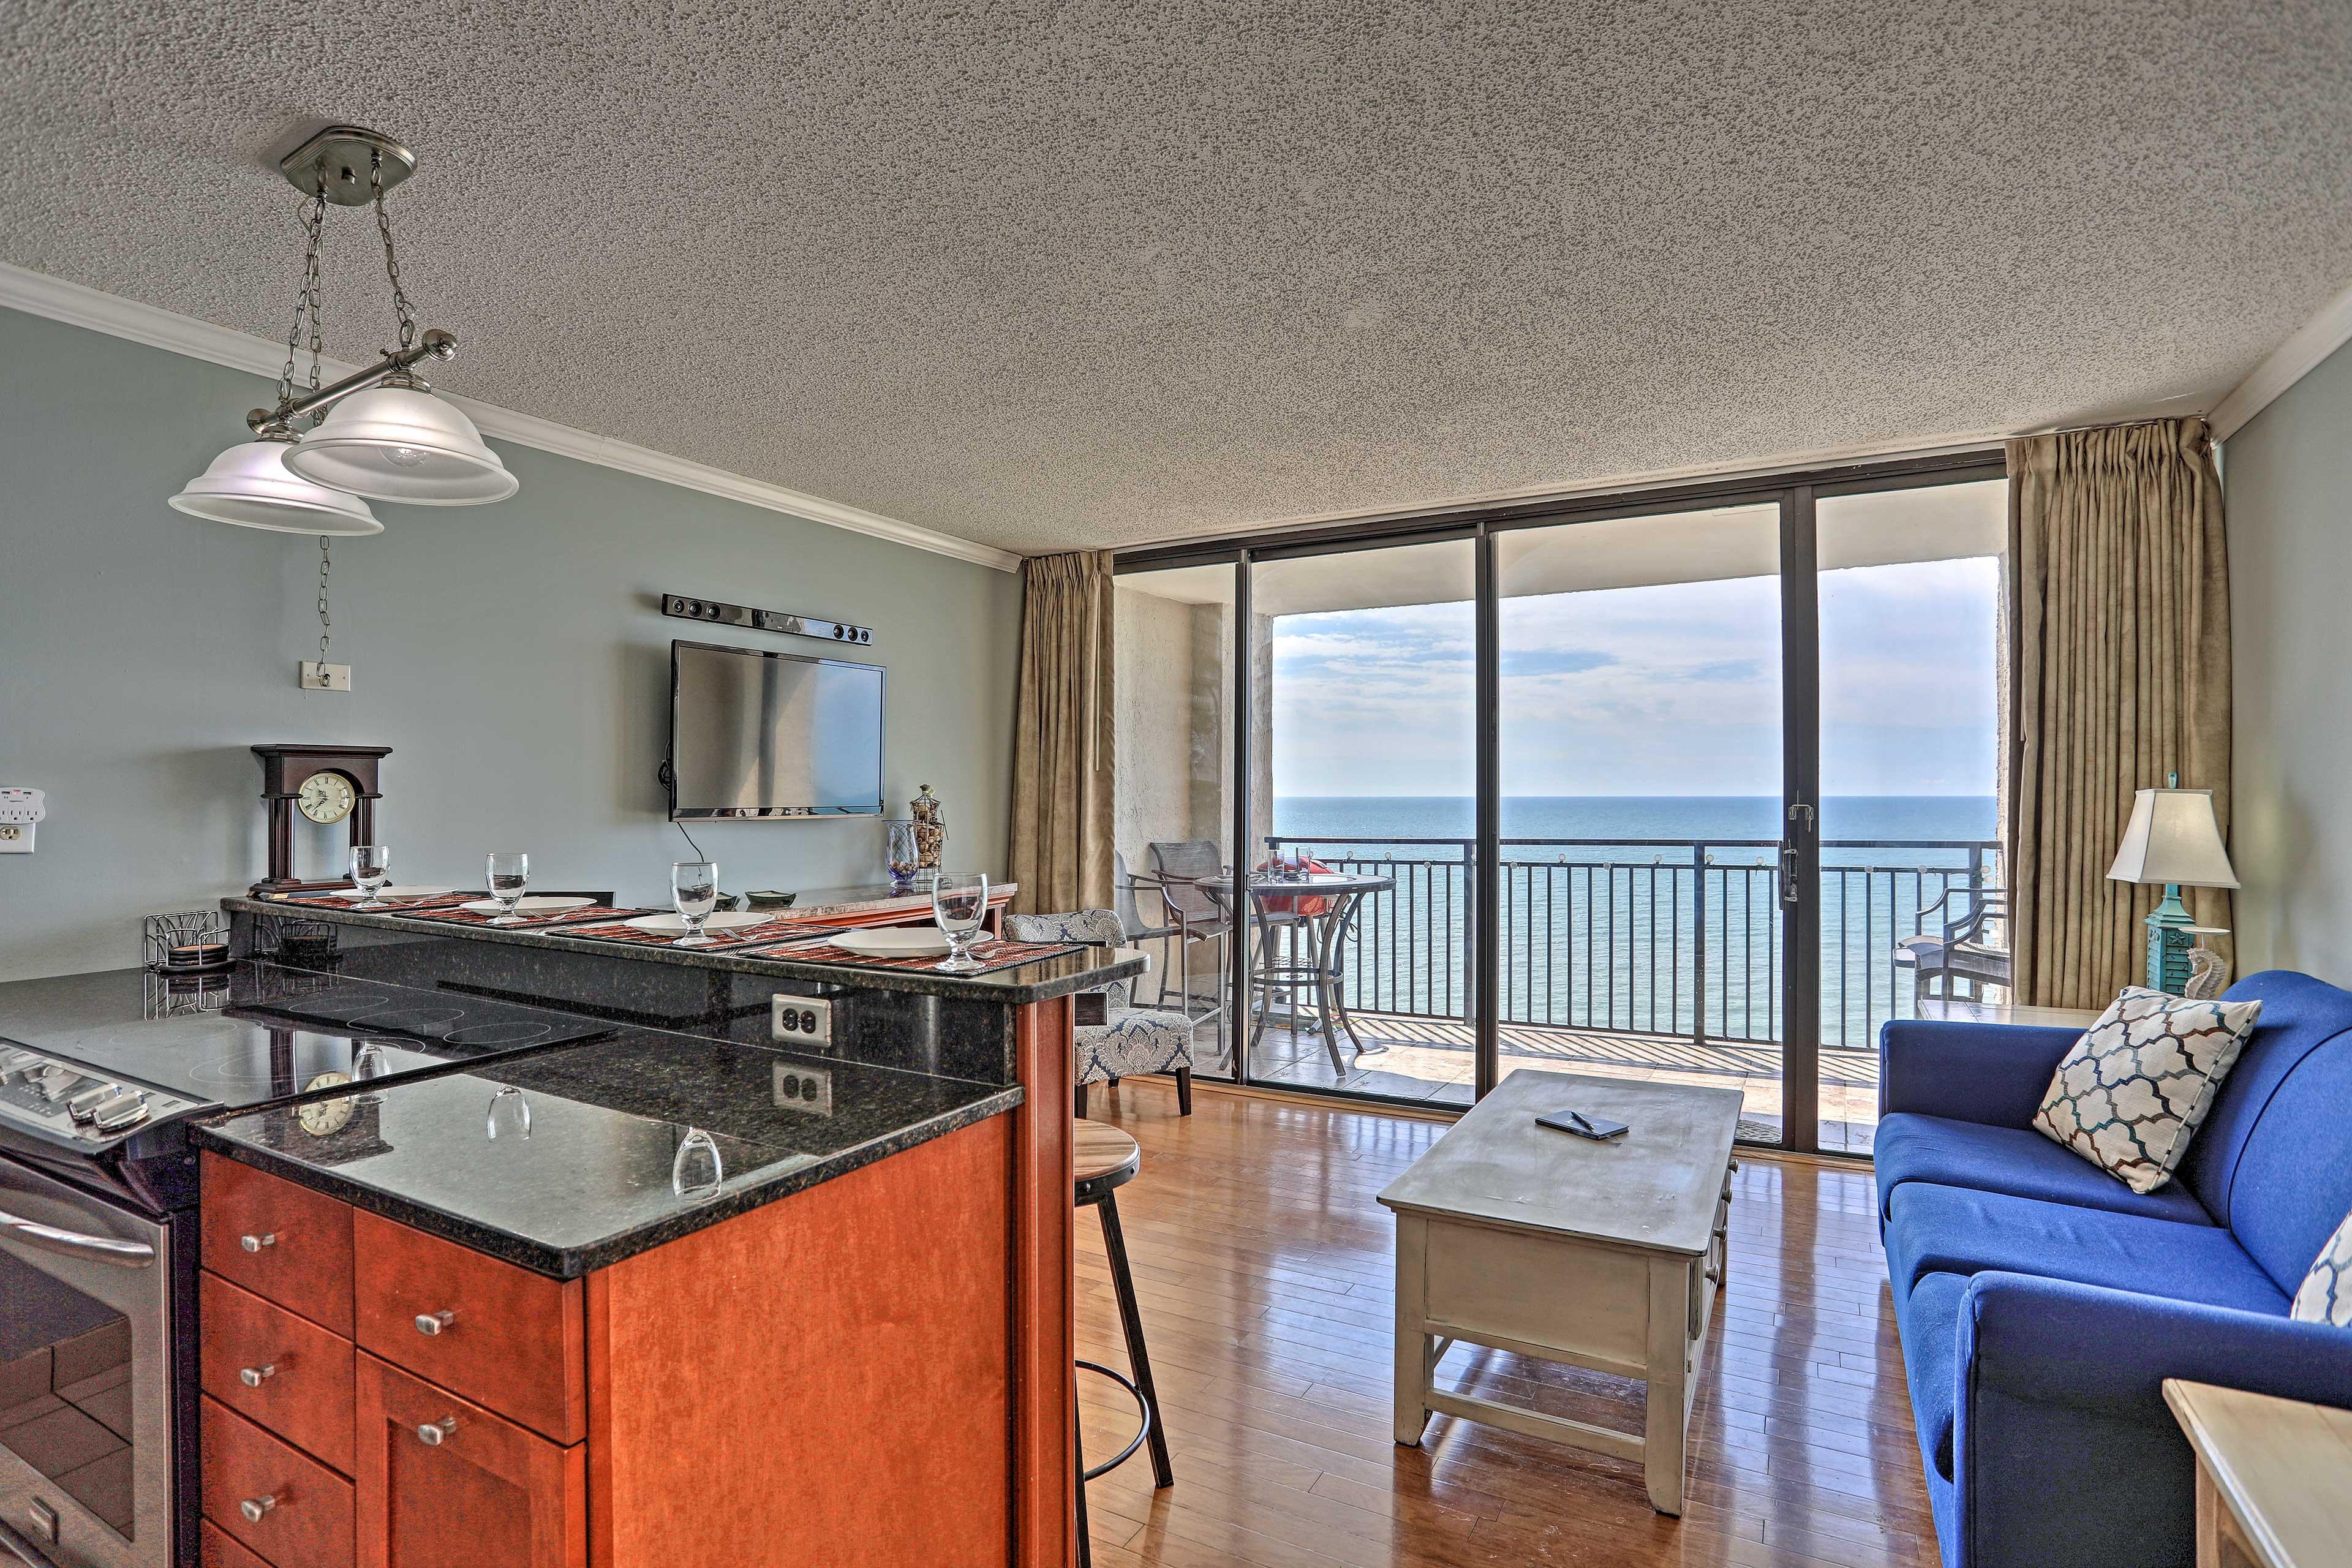 This Myrtle Beach vacation rental sleeps 4 and boasts ocean views.